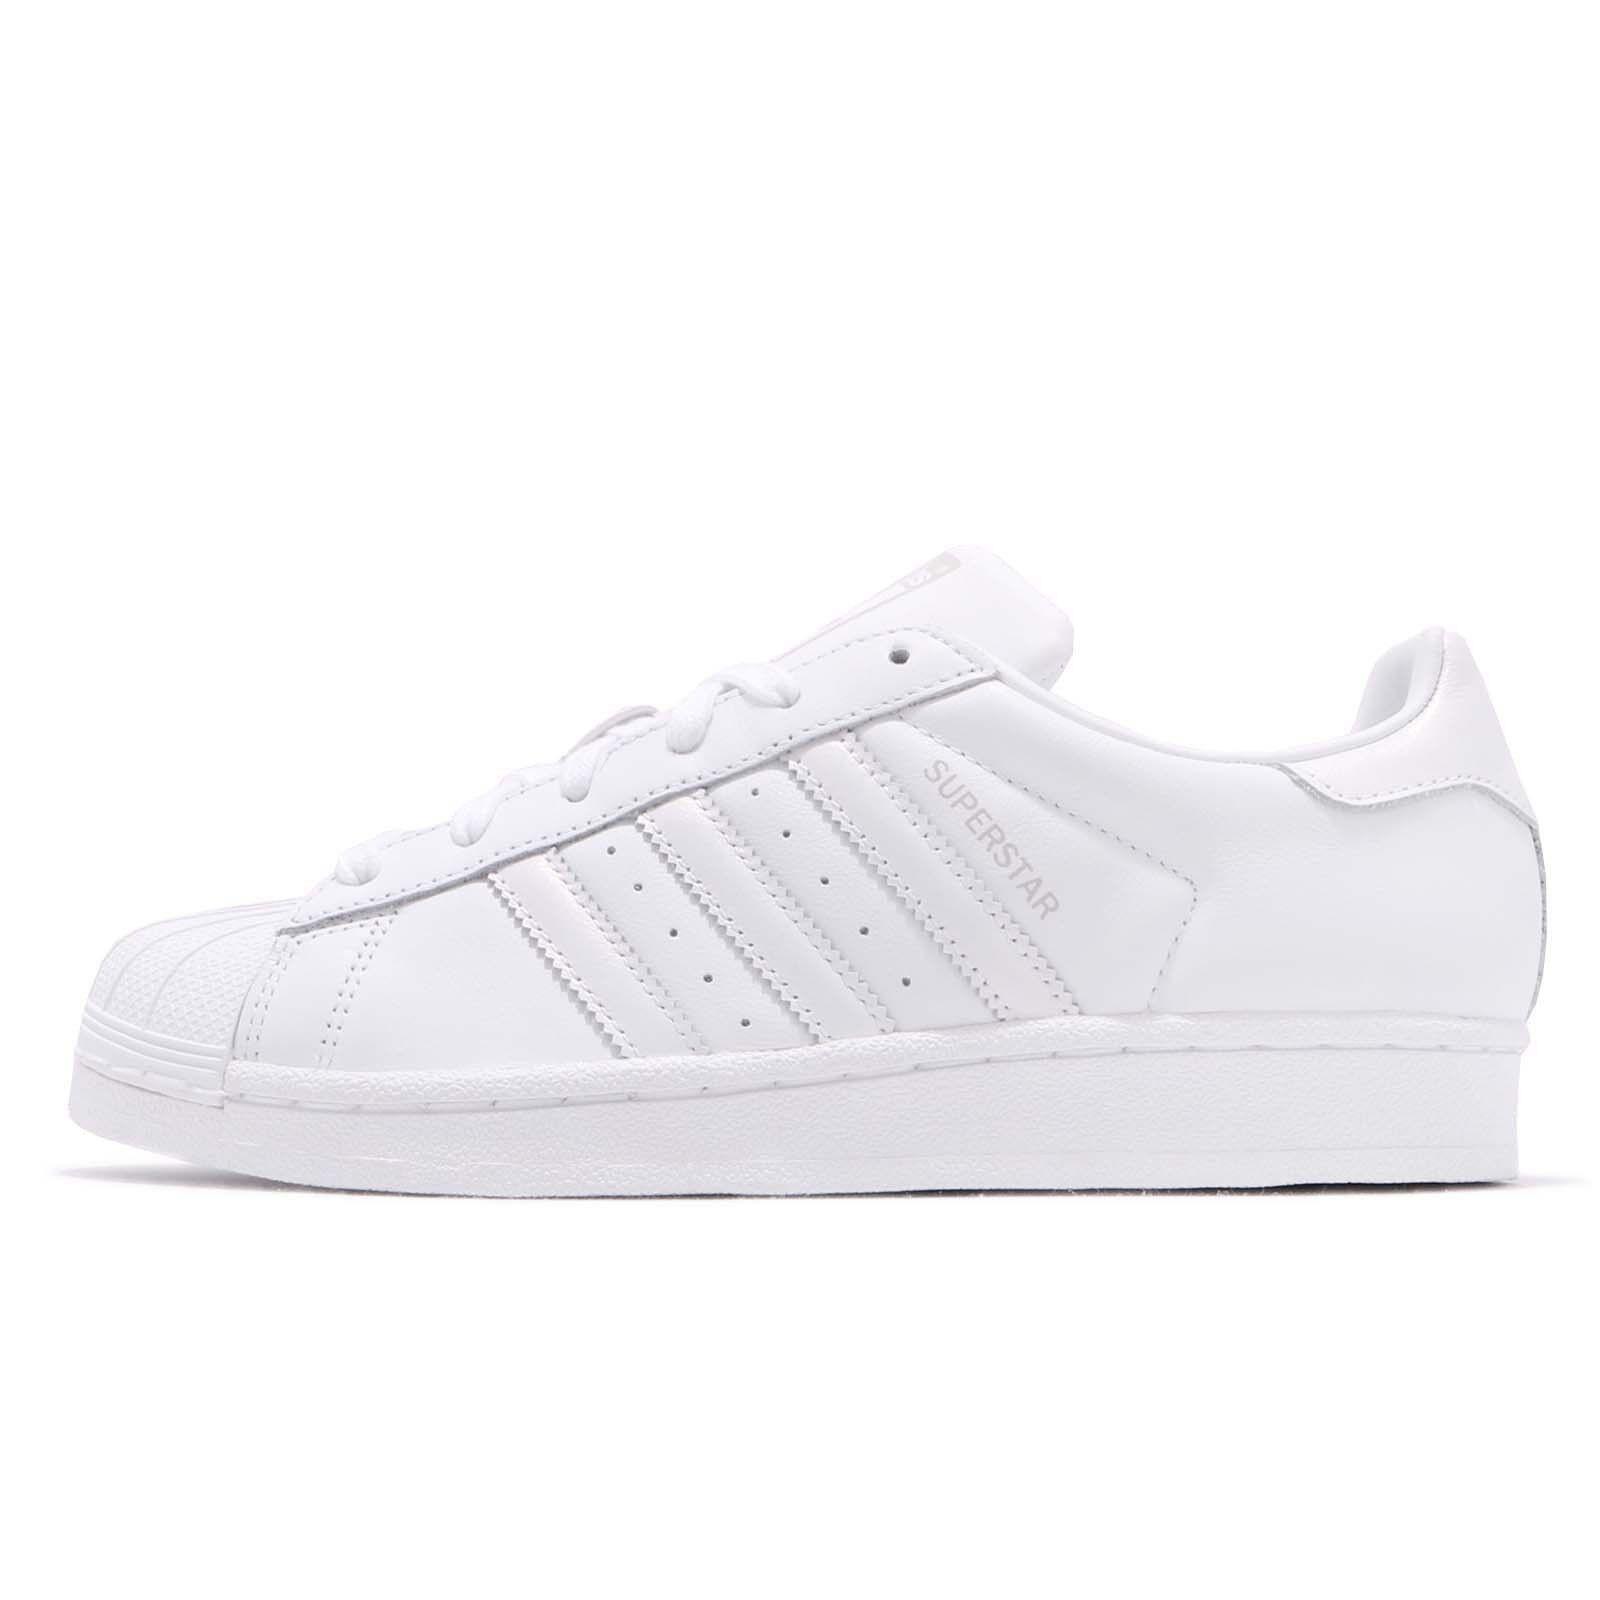 adidas Originals Superstar W Ξ›Ξ΅Ο…ΞΊΟŒ Γκρι Casual Ανδρικά παπούτσια AQ1214